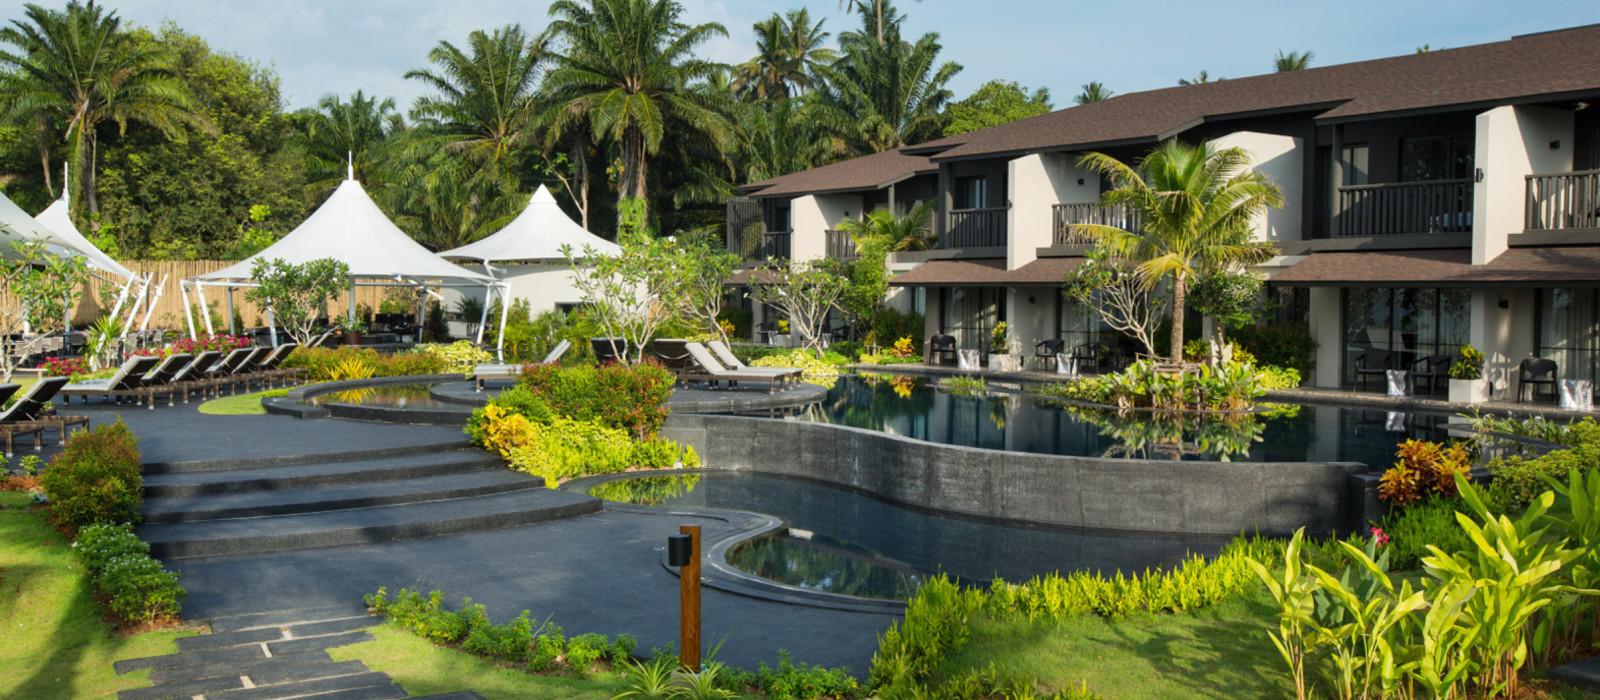 Hotel The ShellSea Krabi Thailand